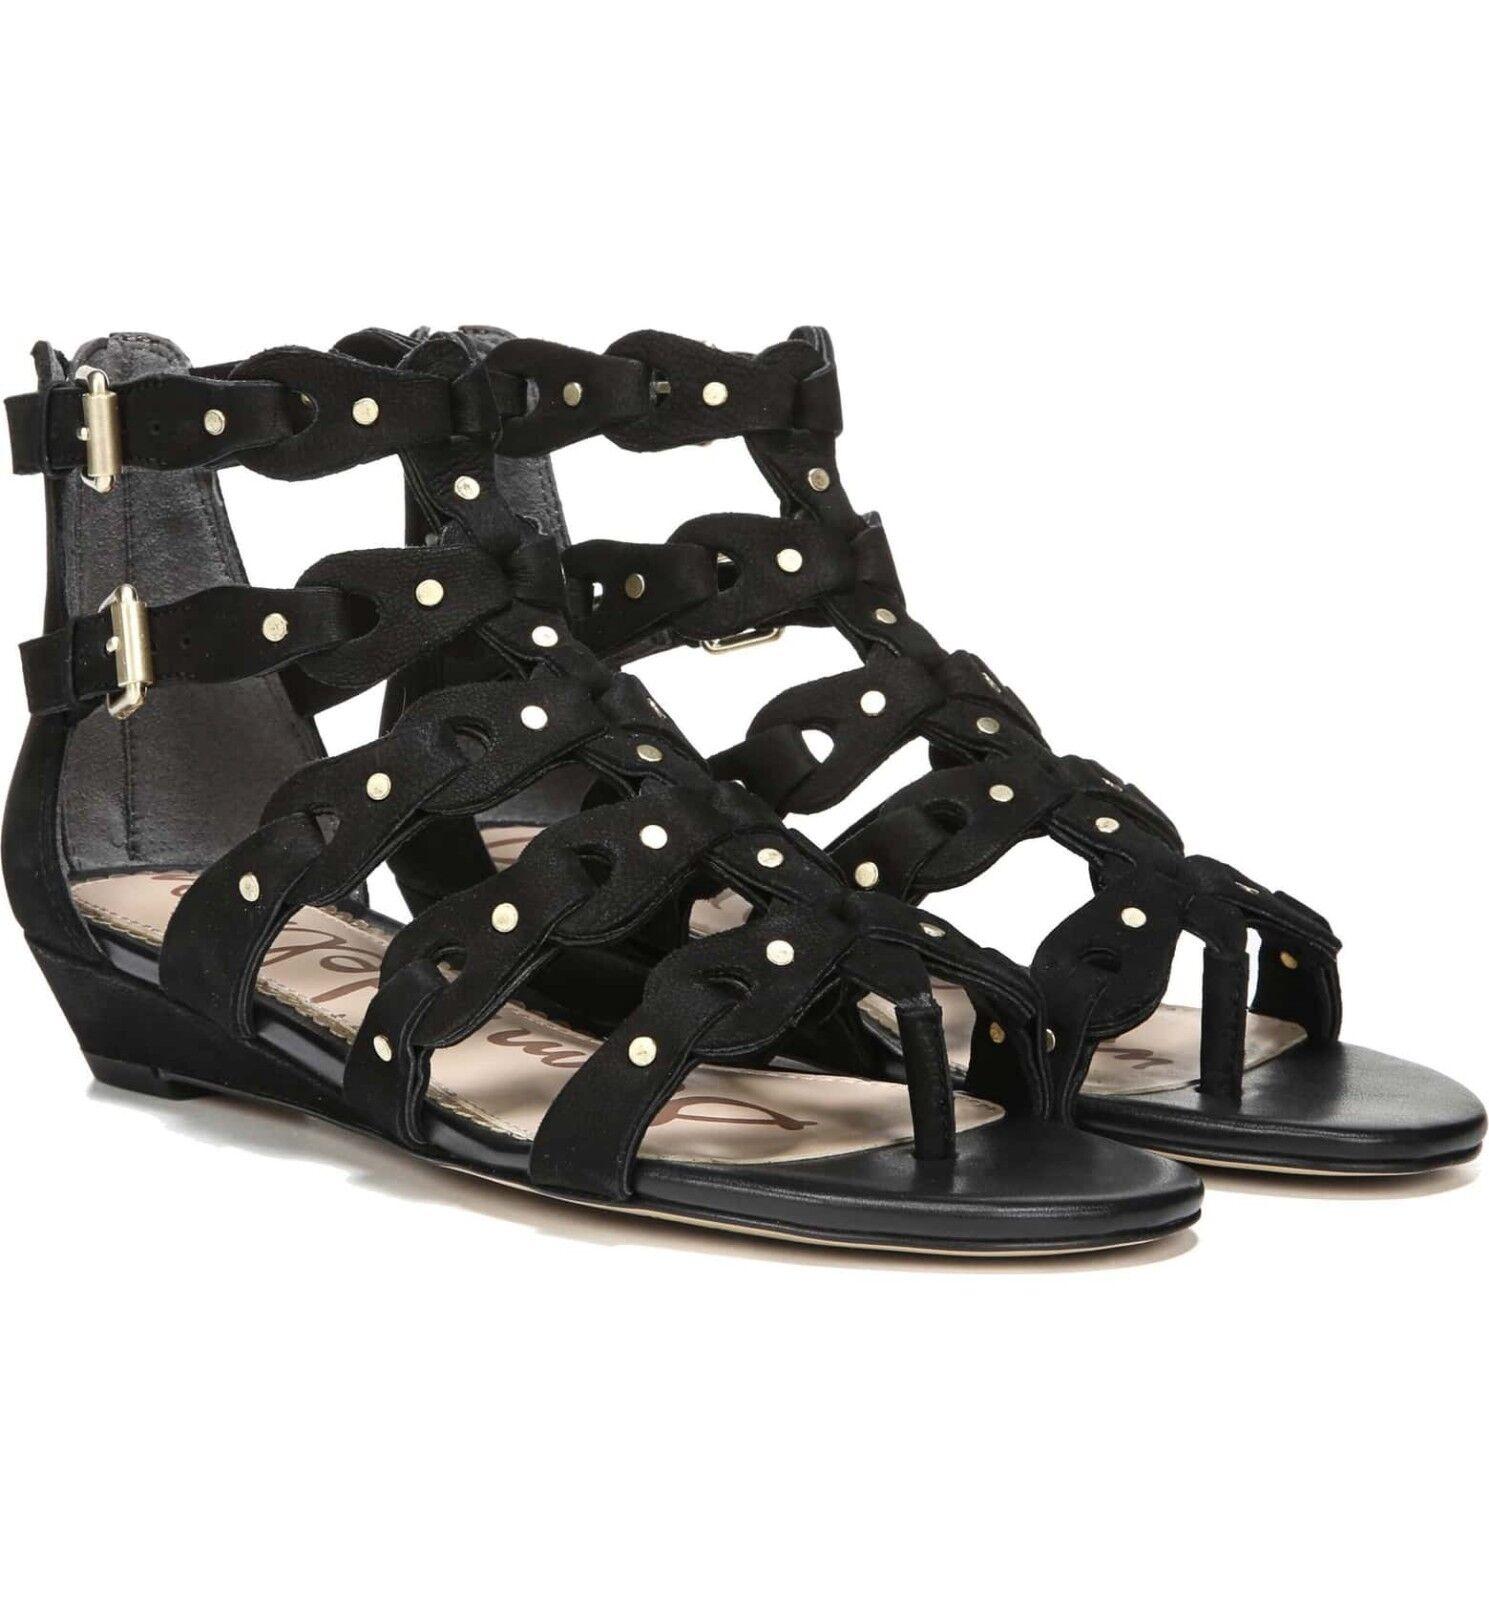 Sam Edelman Sandalias De De De Mujer De Gamuza Cuero Negro Tachonado Draper jaula Zapato 7M Nuevo  ventas en linea